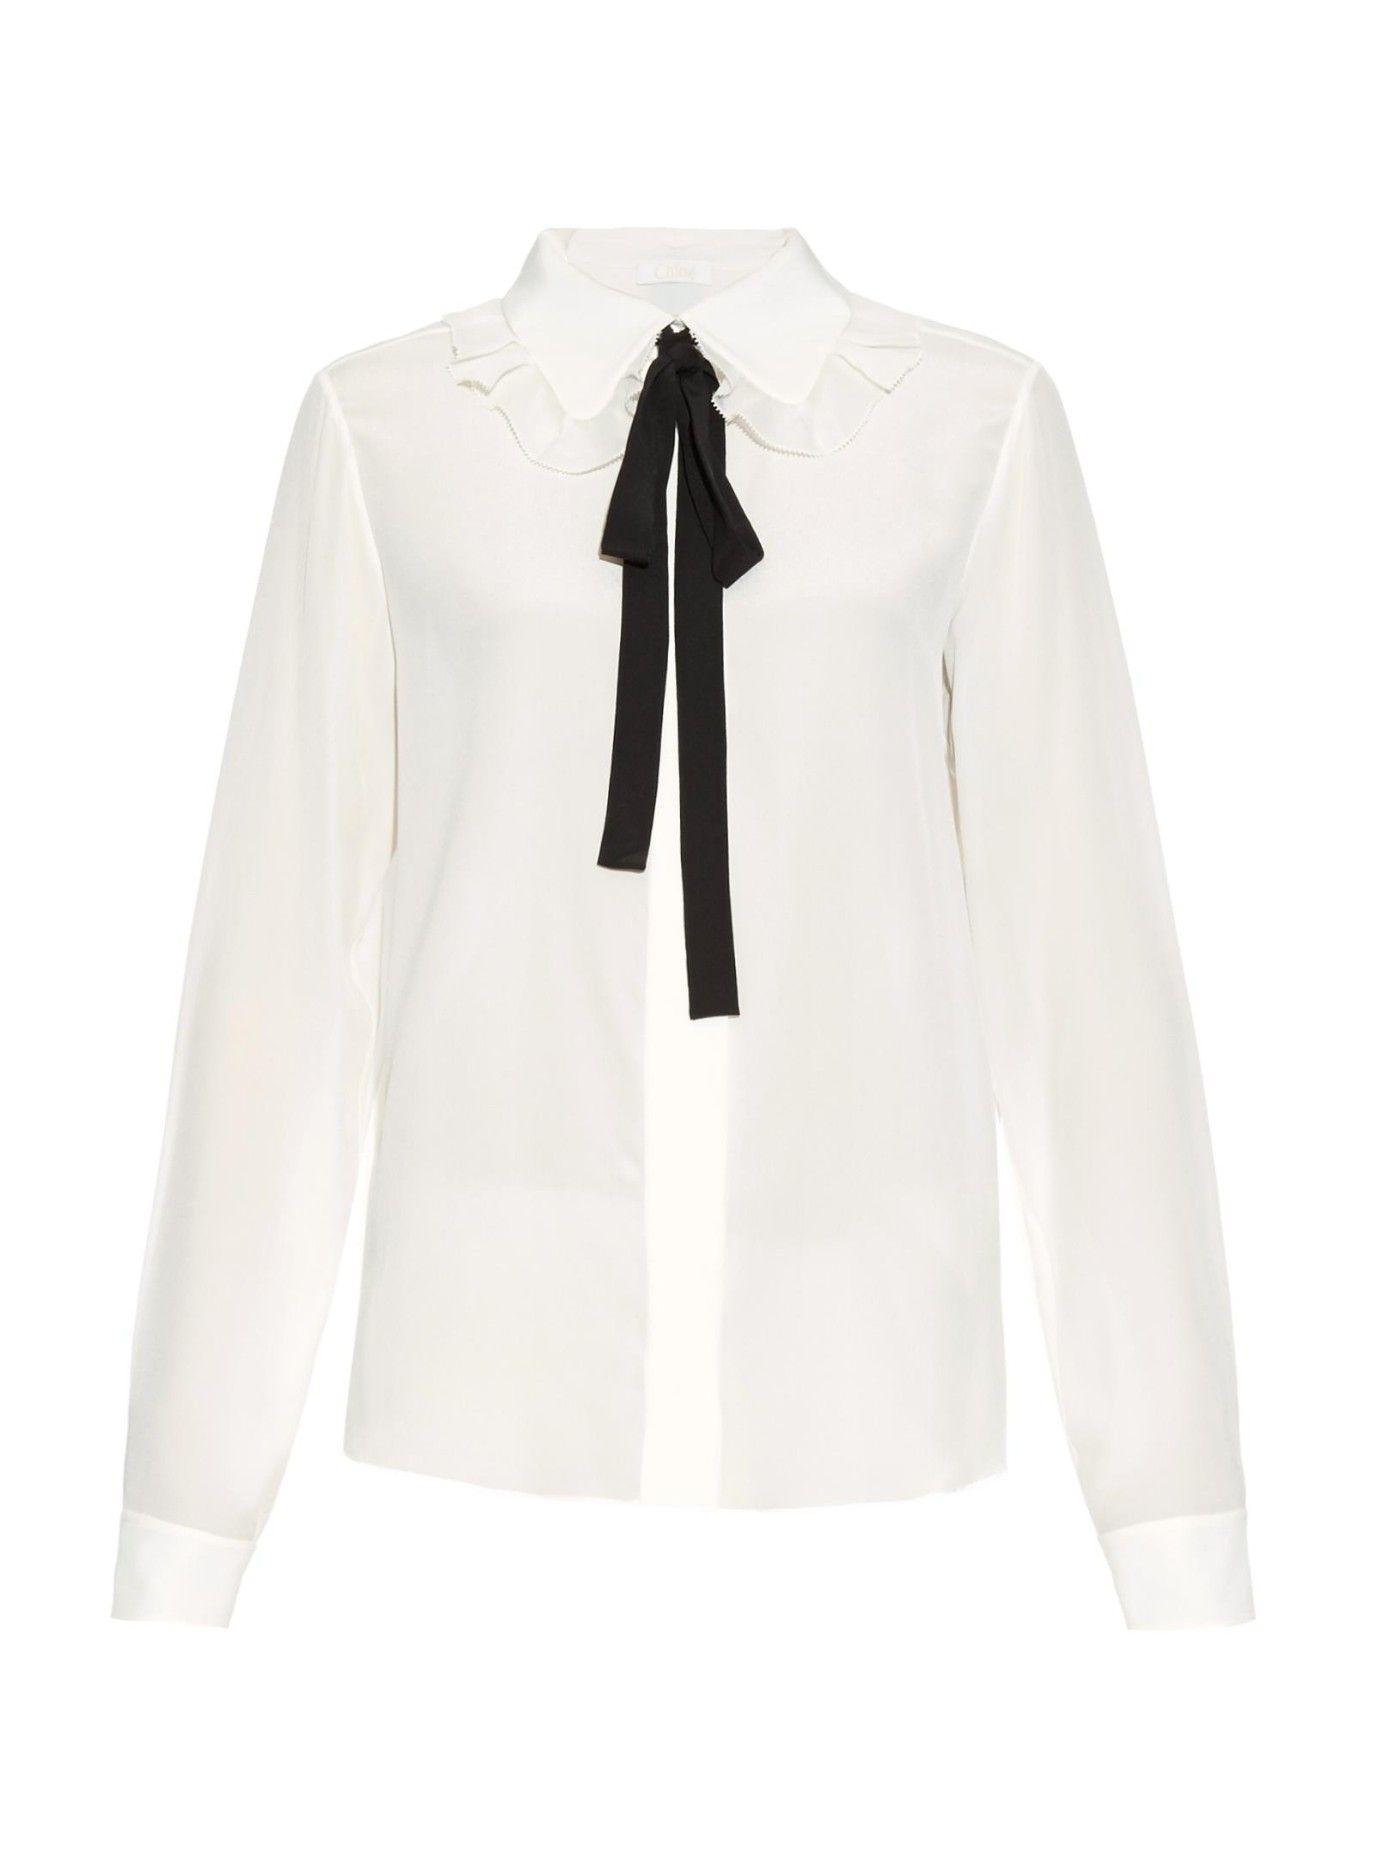 ddc1de520a3bea Ruffled-collar silk shirt by Chloé | Shop now at #MATCHESFASHION.COM ...